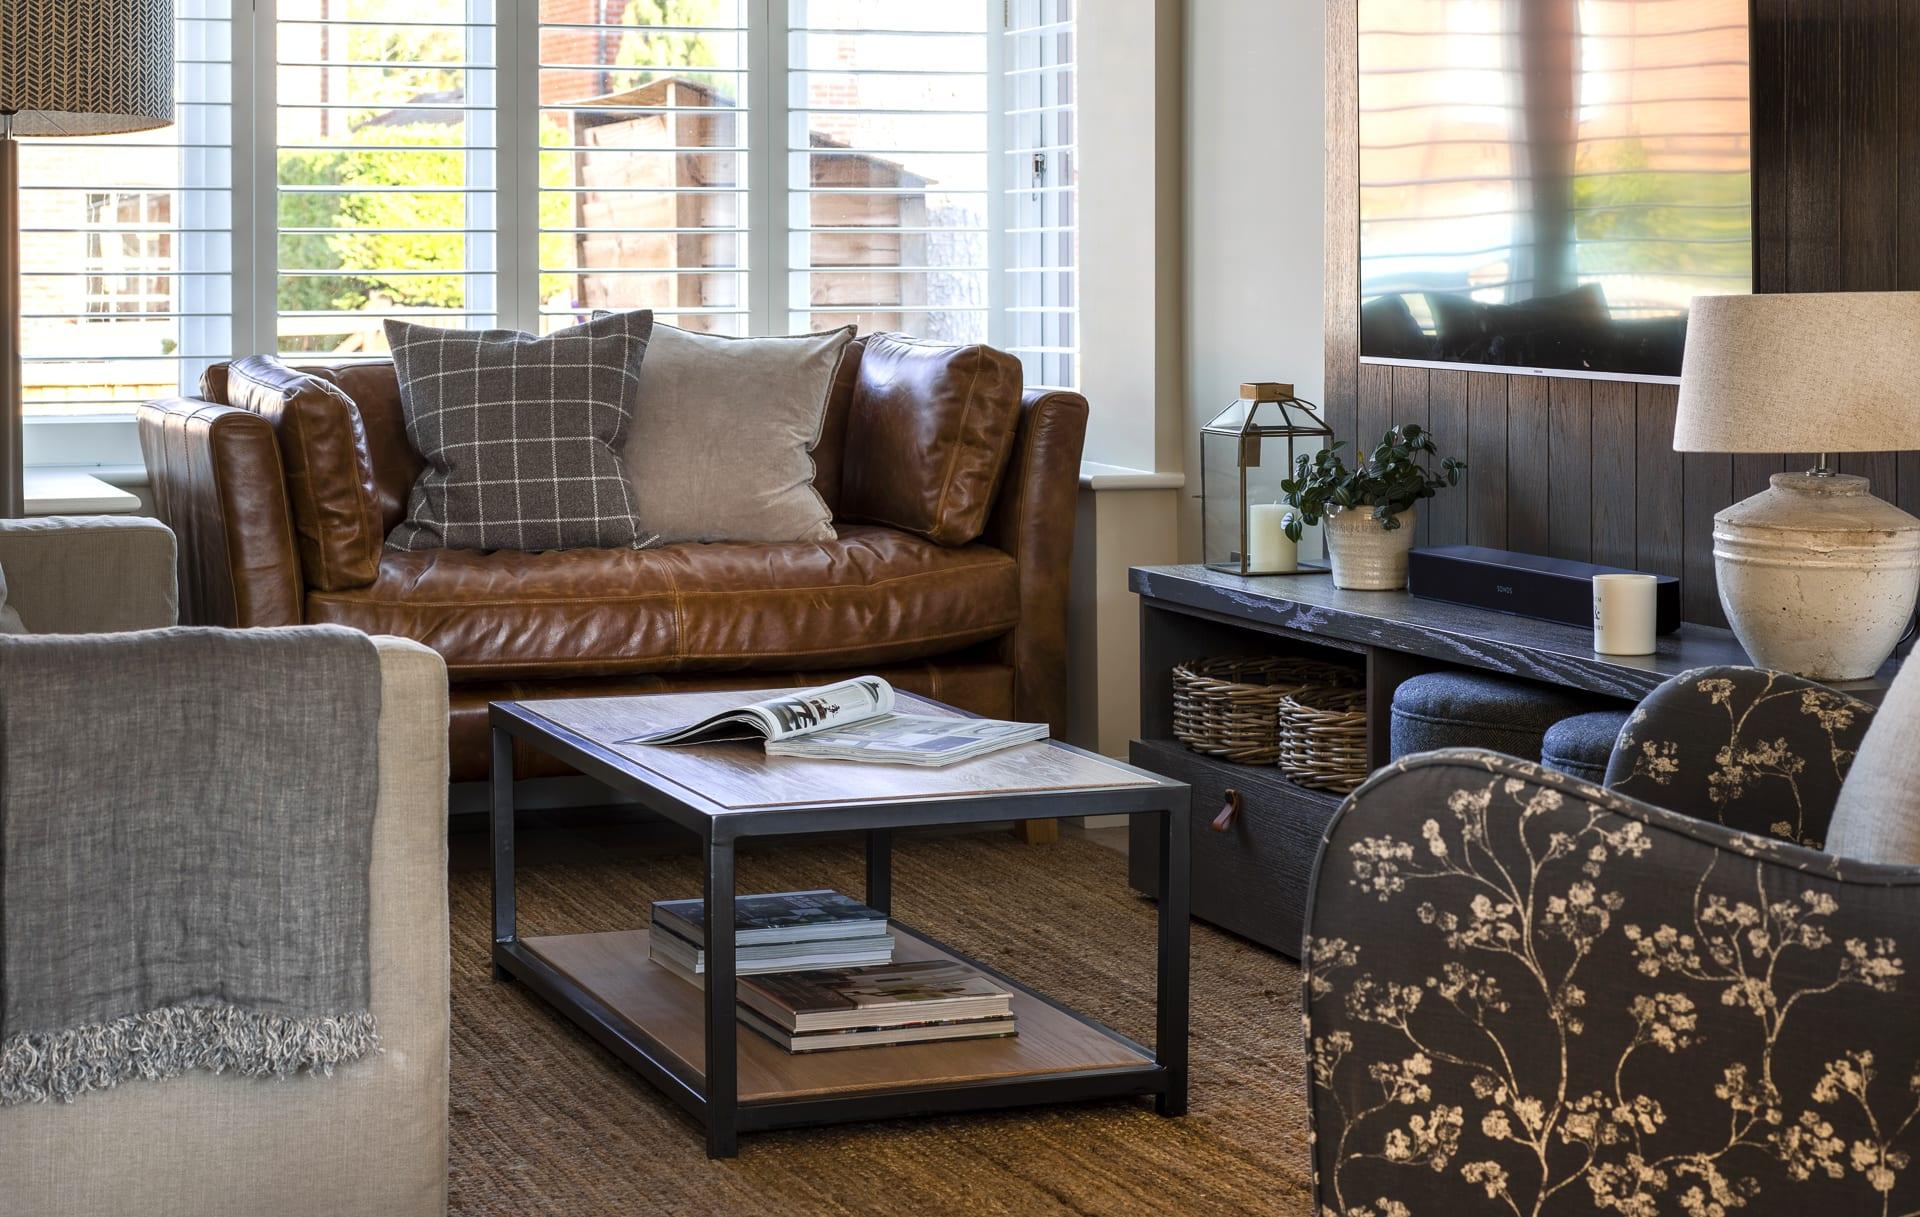 Interior Design Ideas | Interior Designers New Forest | Willow Lifestyle